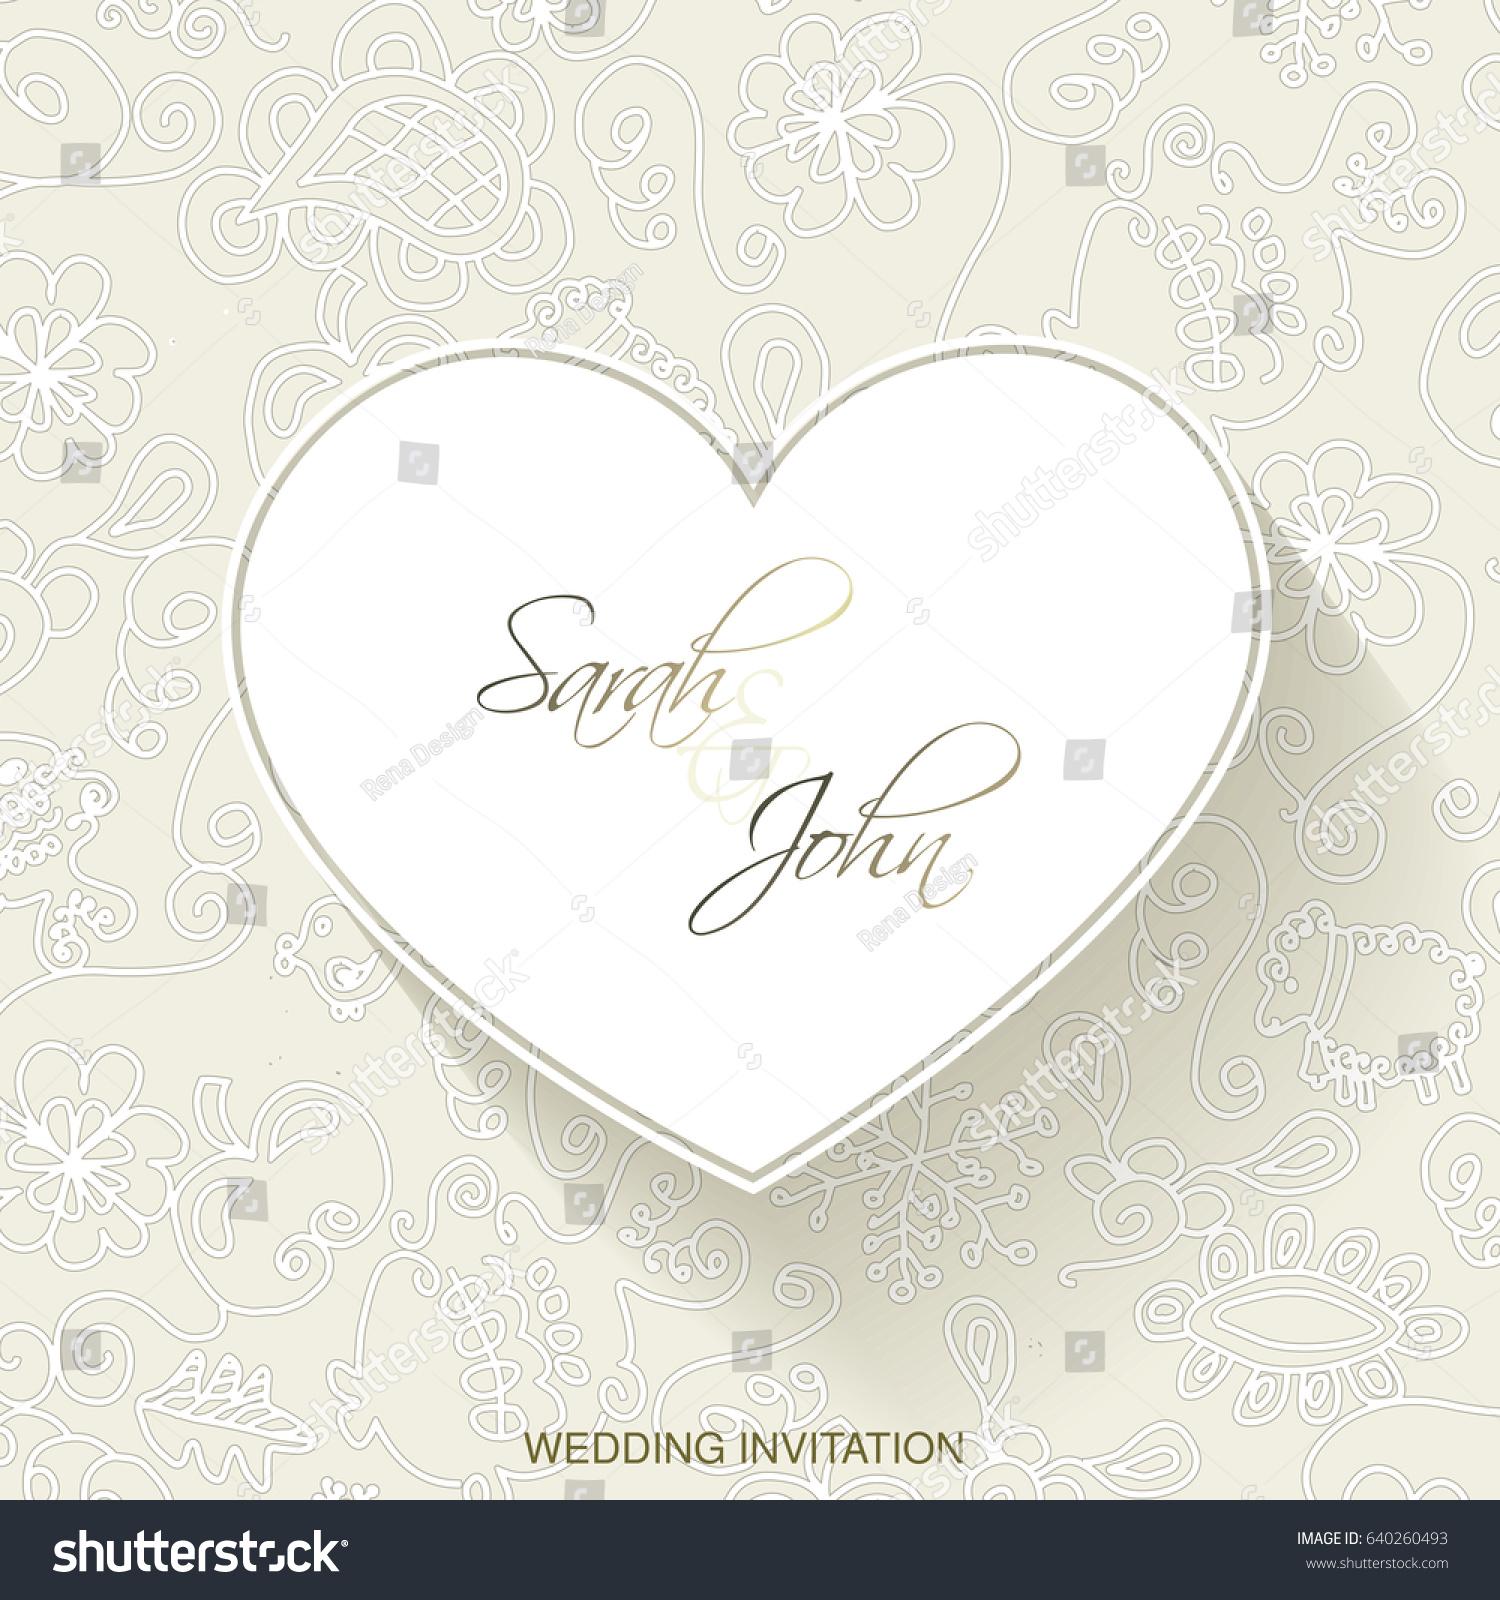 Vector Wedding Invitation Heart Vintage Frame Stock Vector ...